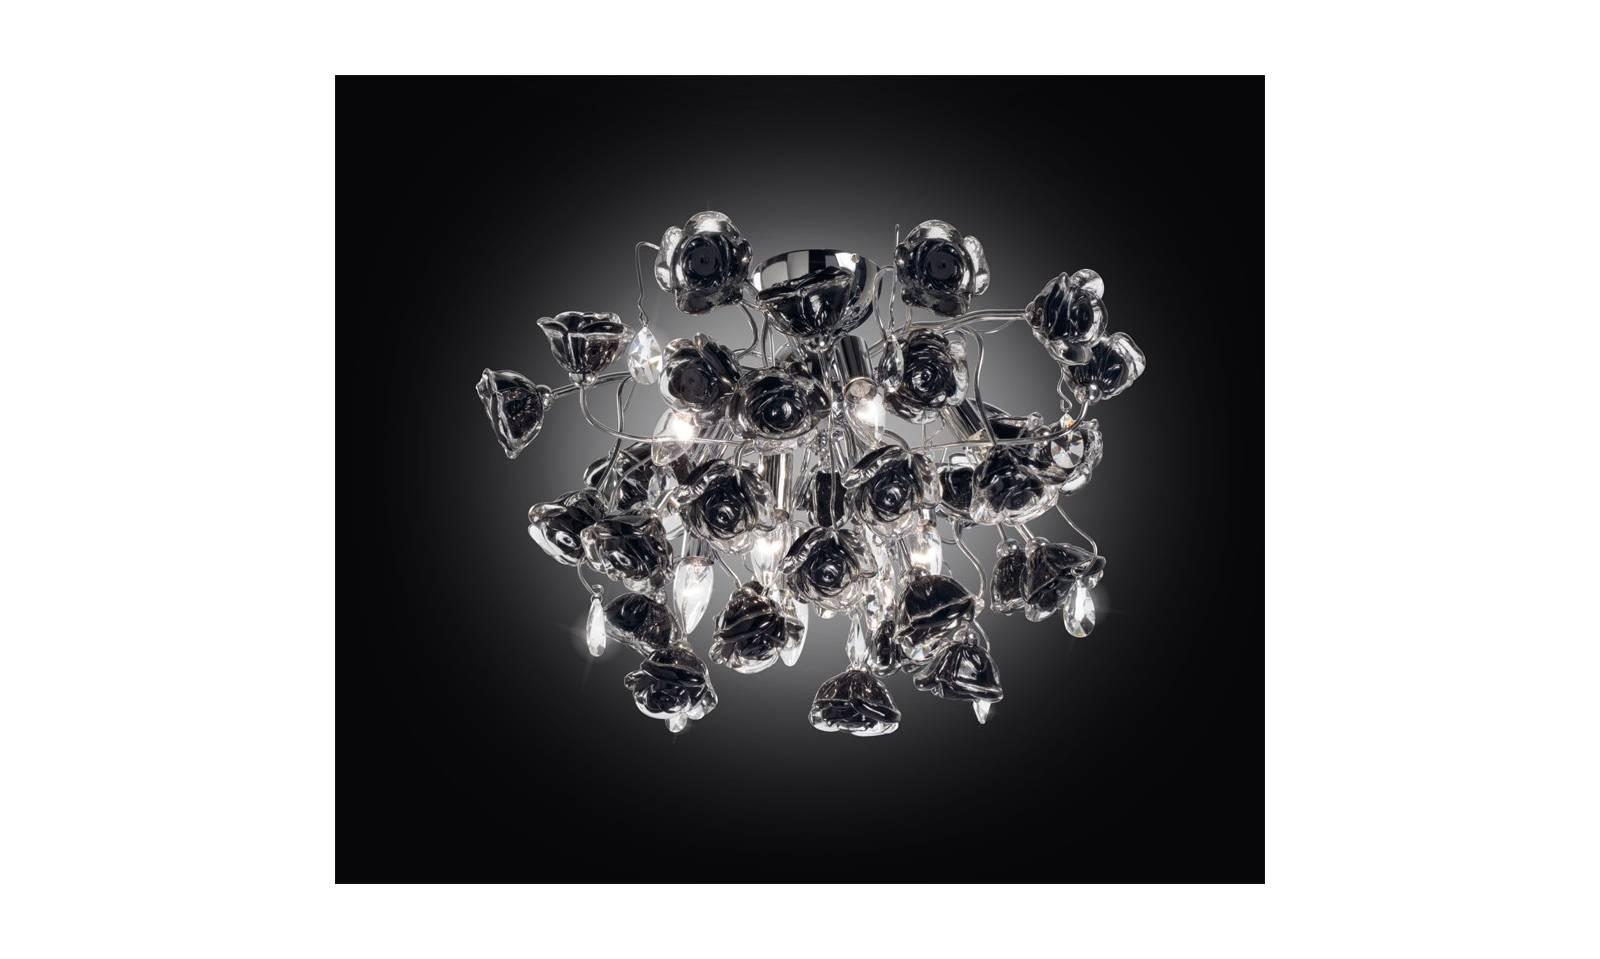 lampadari fan : Lampadari e lampade moderne ciciriello - fan eeurope top light ...